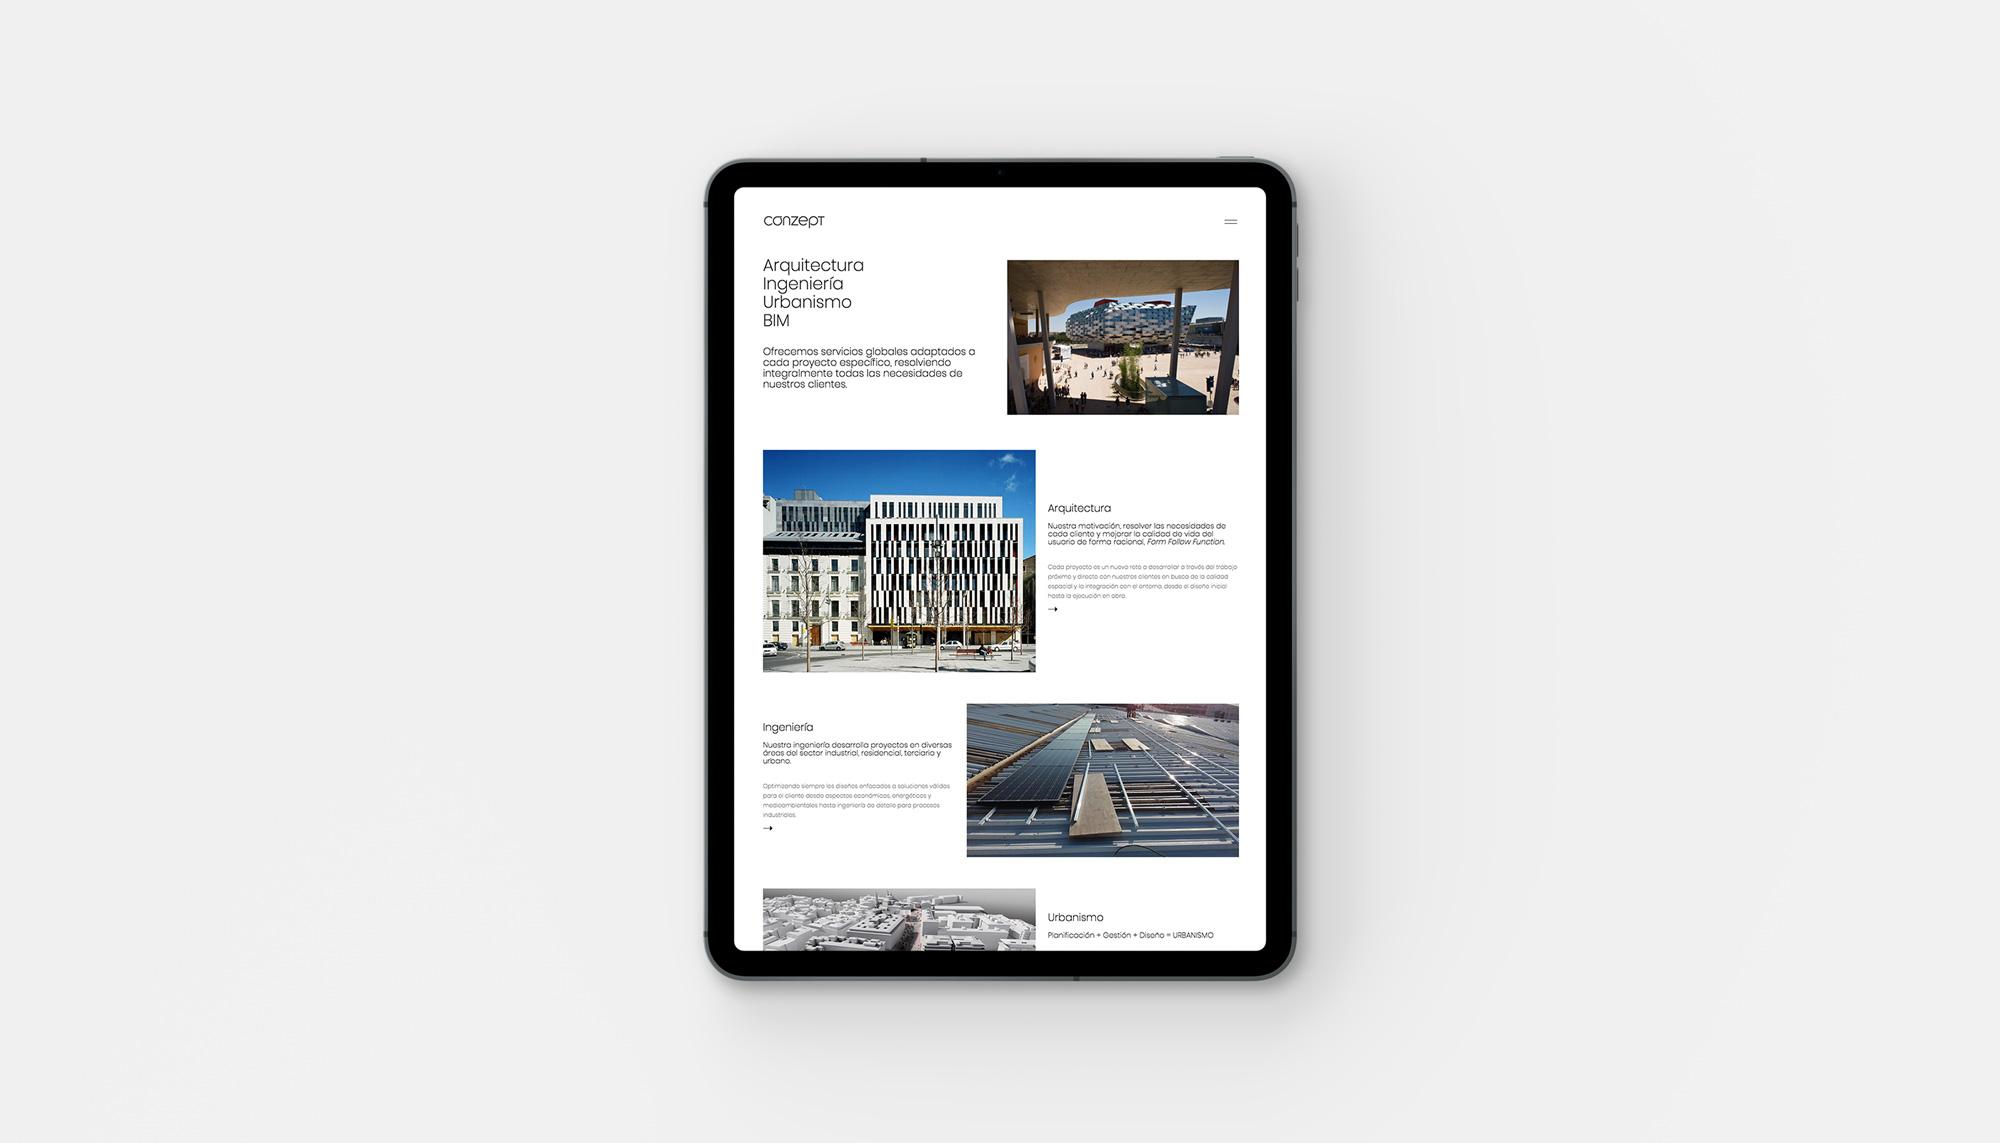 Web Conzept Arquitectura Ingeniería Urbanismo